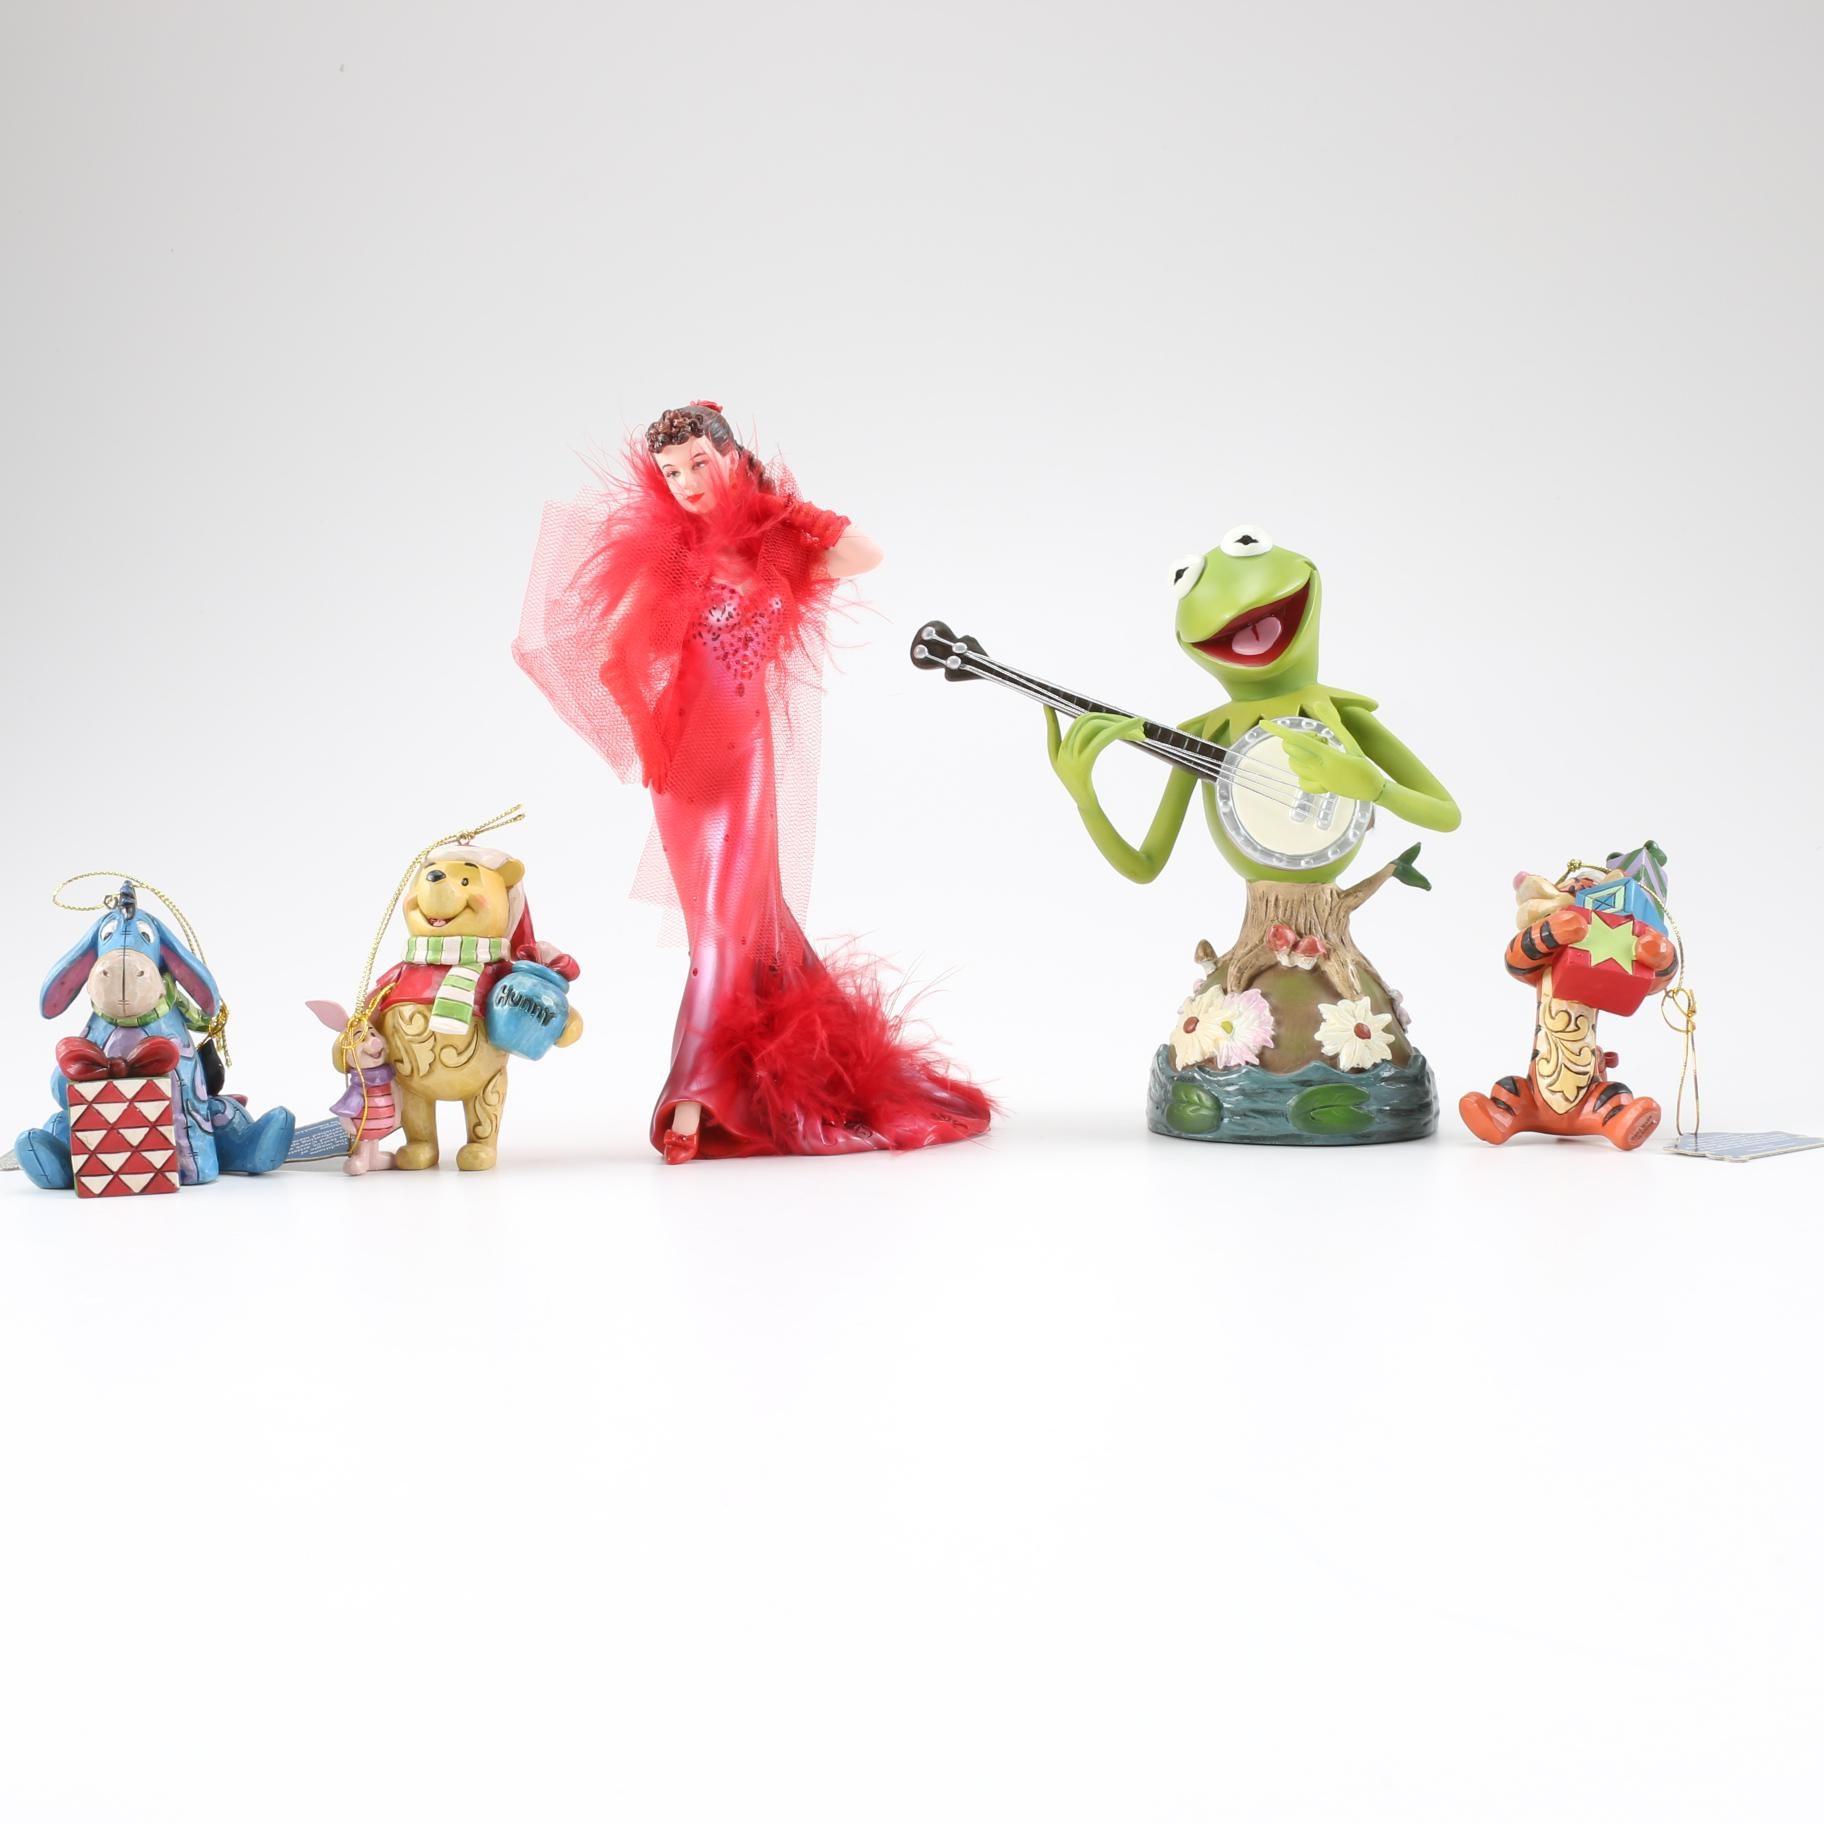 Collection of Enesco Figurines